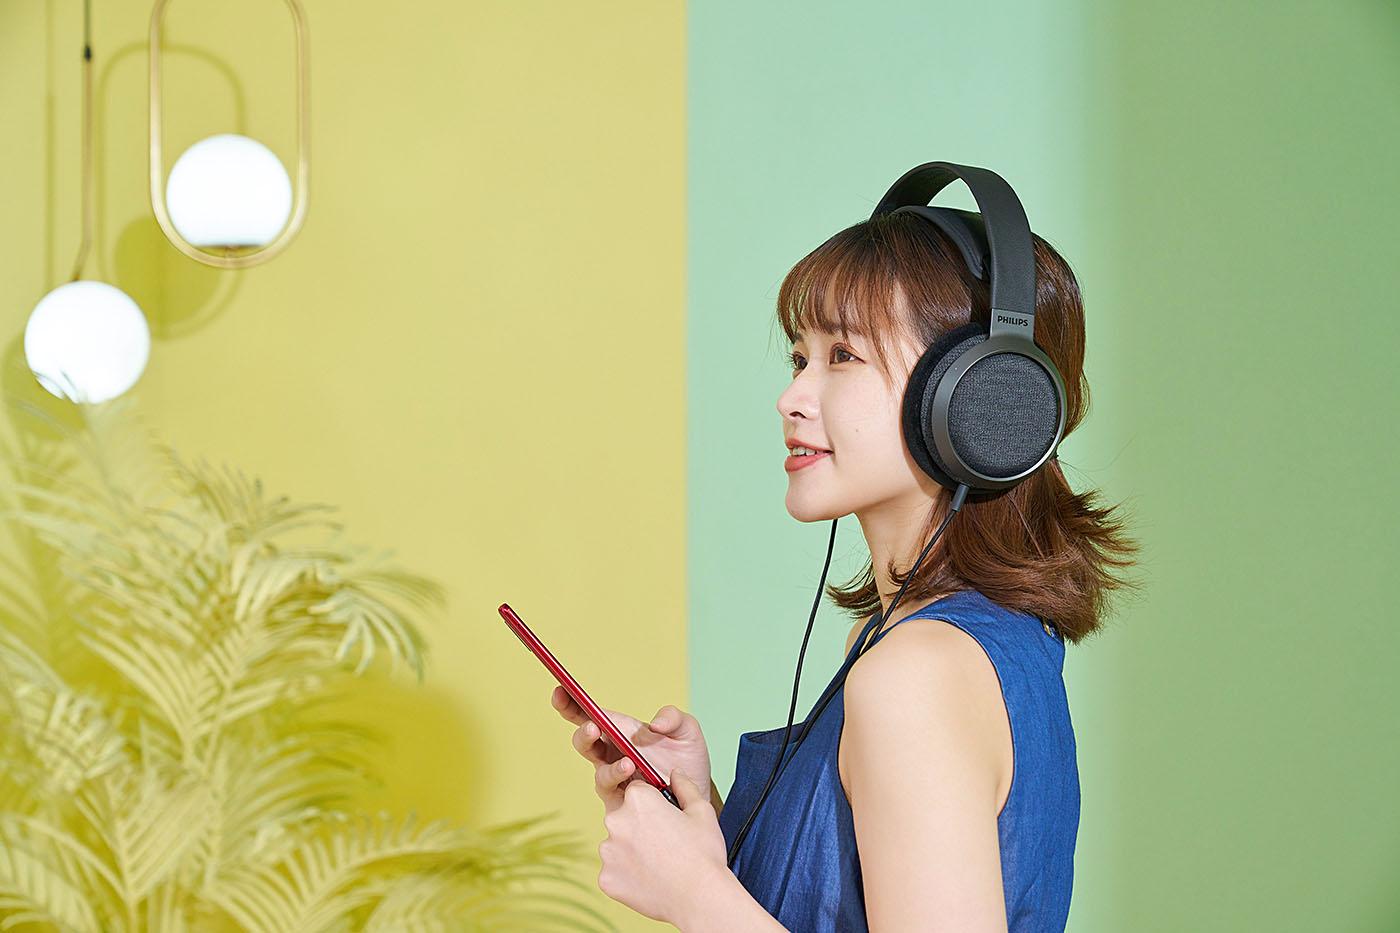 聽見音樂的靈魂,Philips Fidelio X3 Hi-Res Audio 有線覆耳式耳機